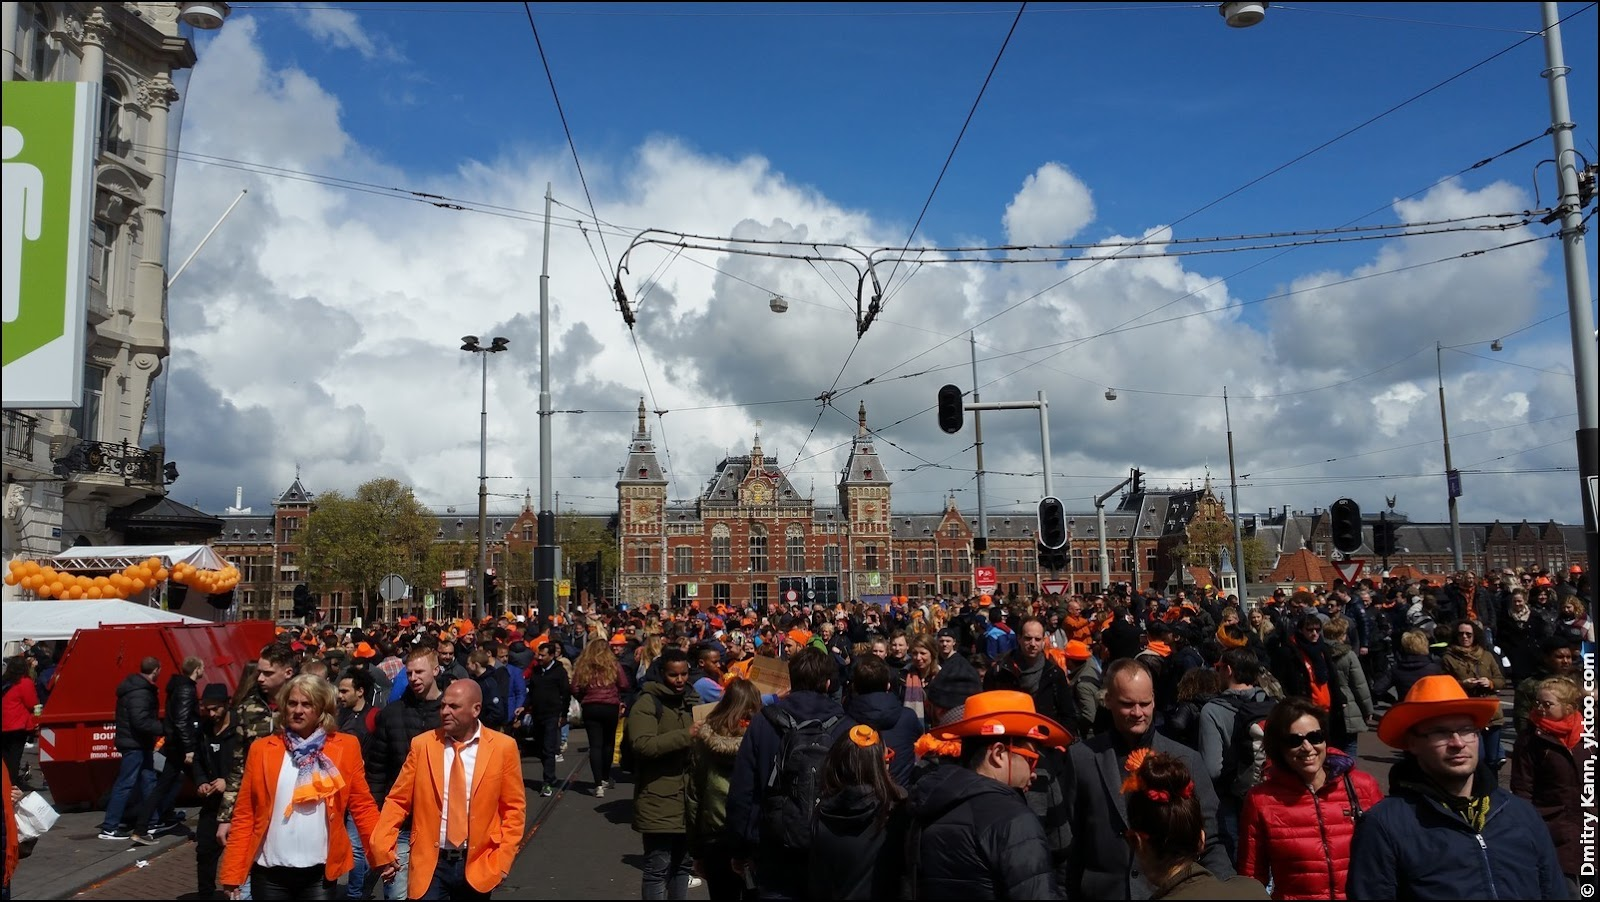 Amsterdam Central Railway Station.